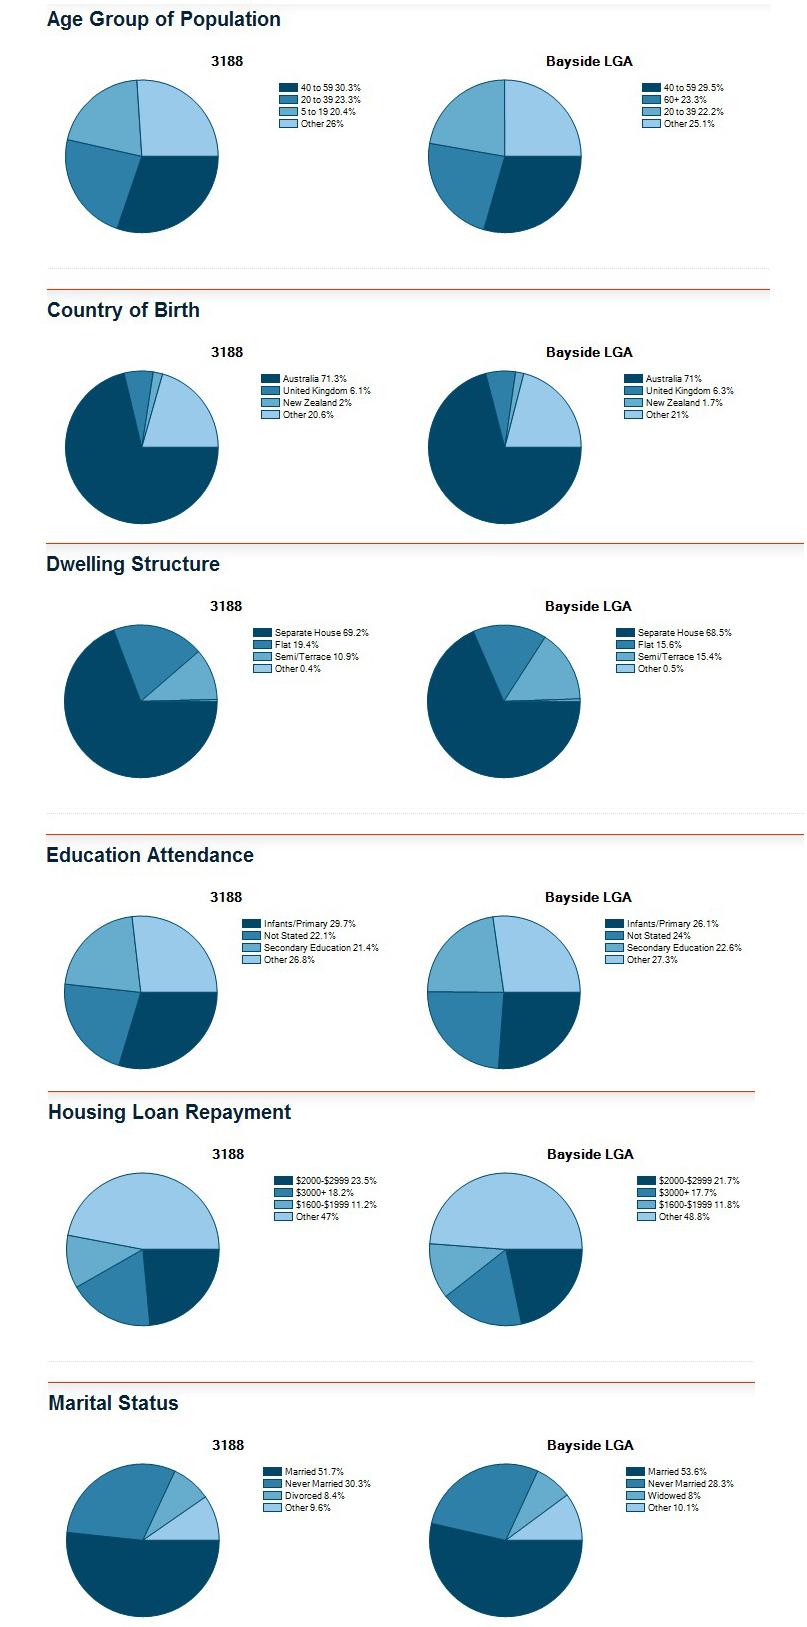 Hampton地区与墨尔本数据整体对比